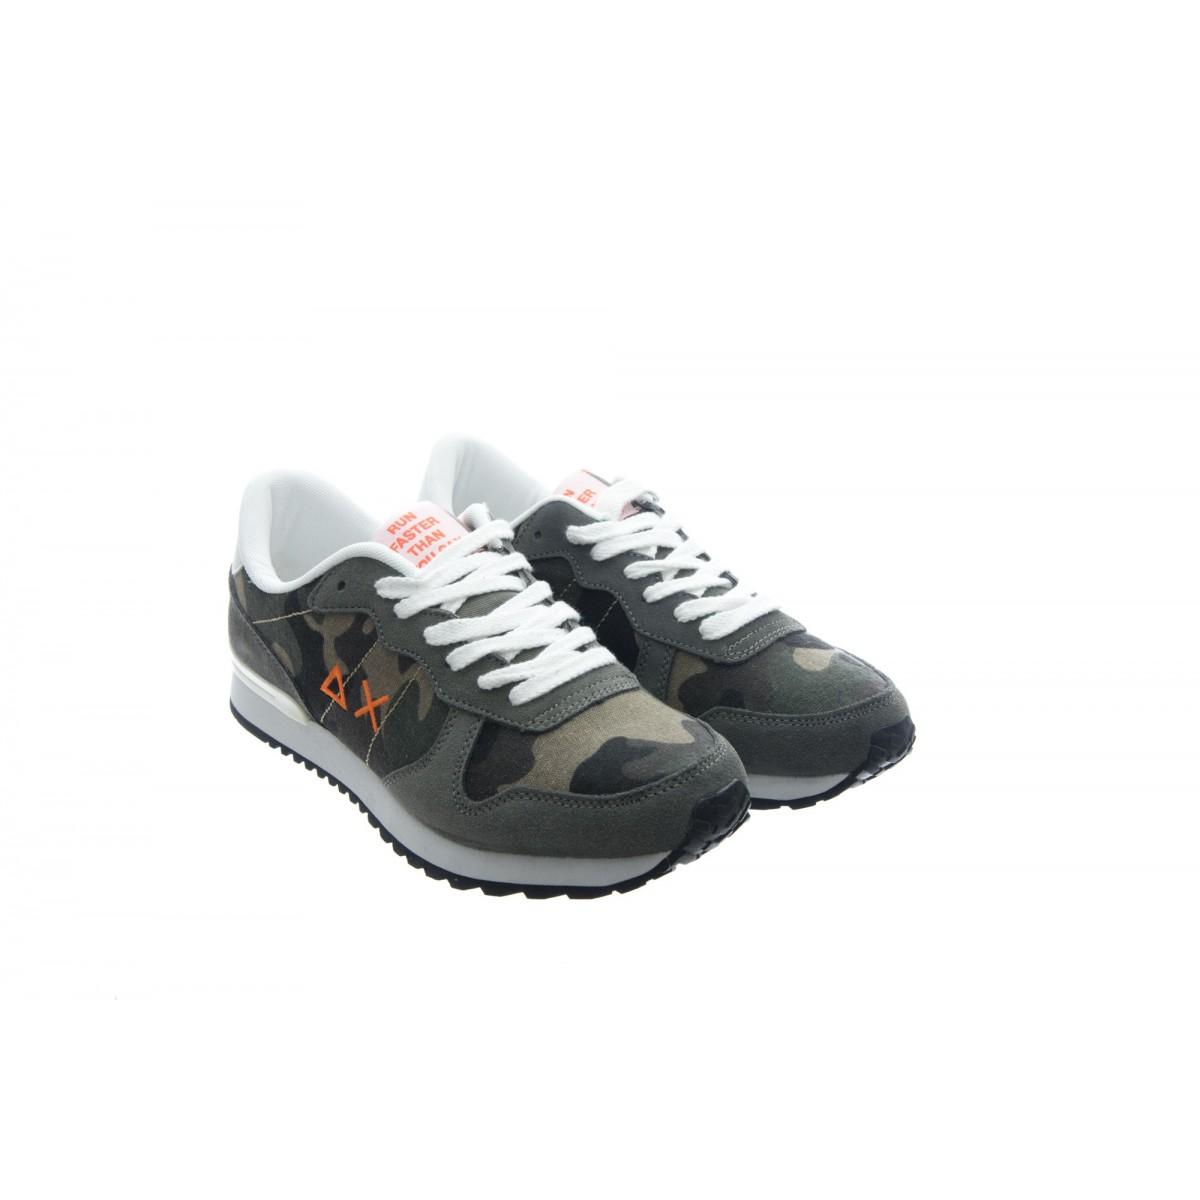 Scarpa - S0003 sneakers uomo